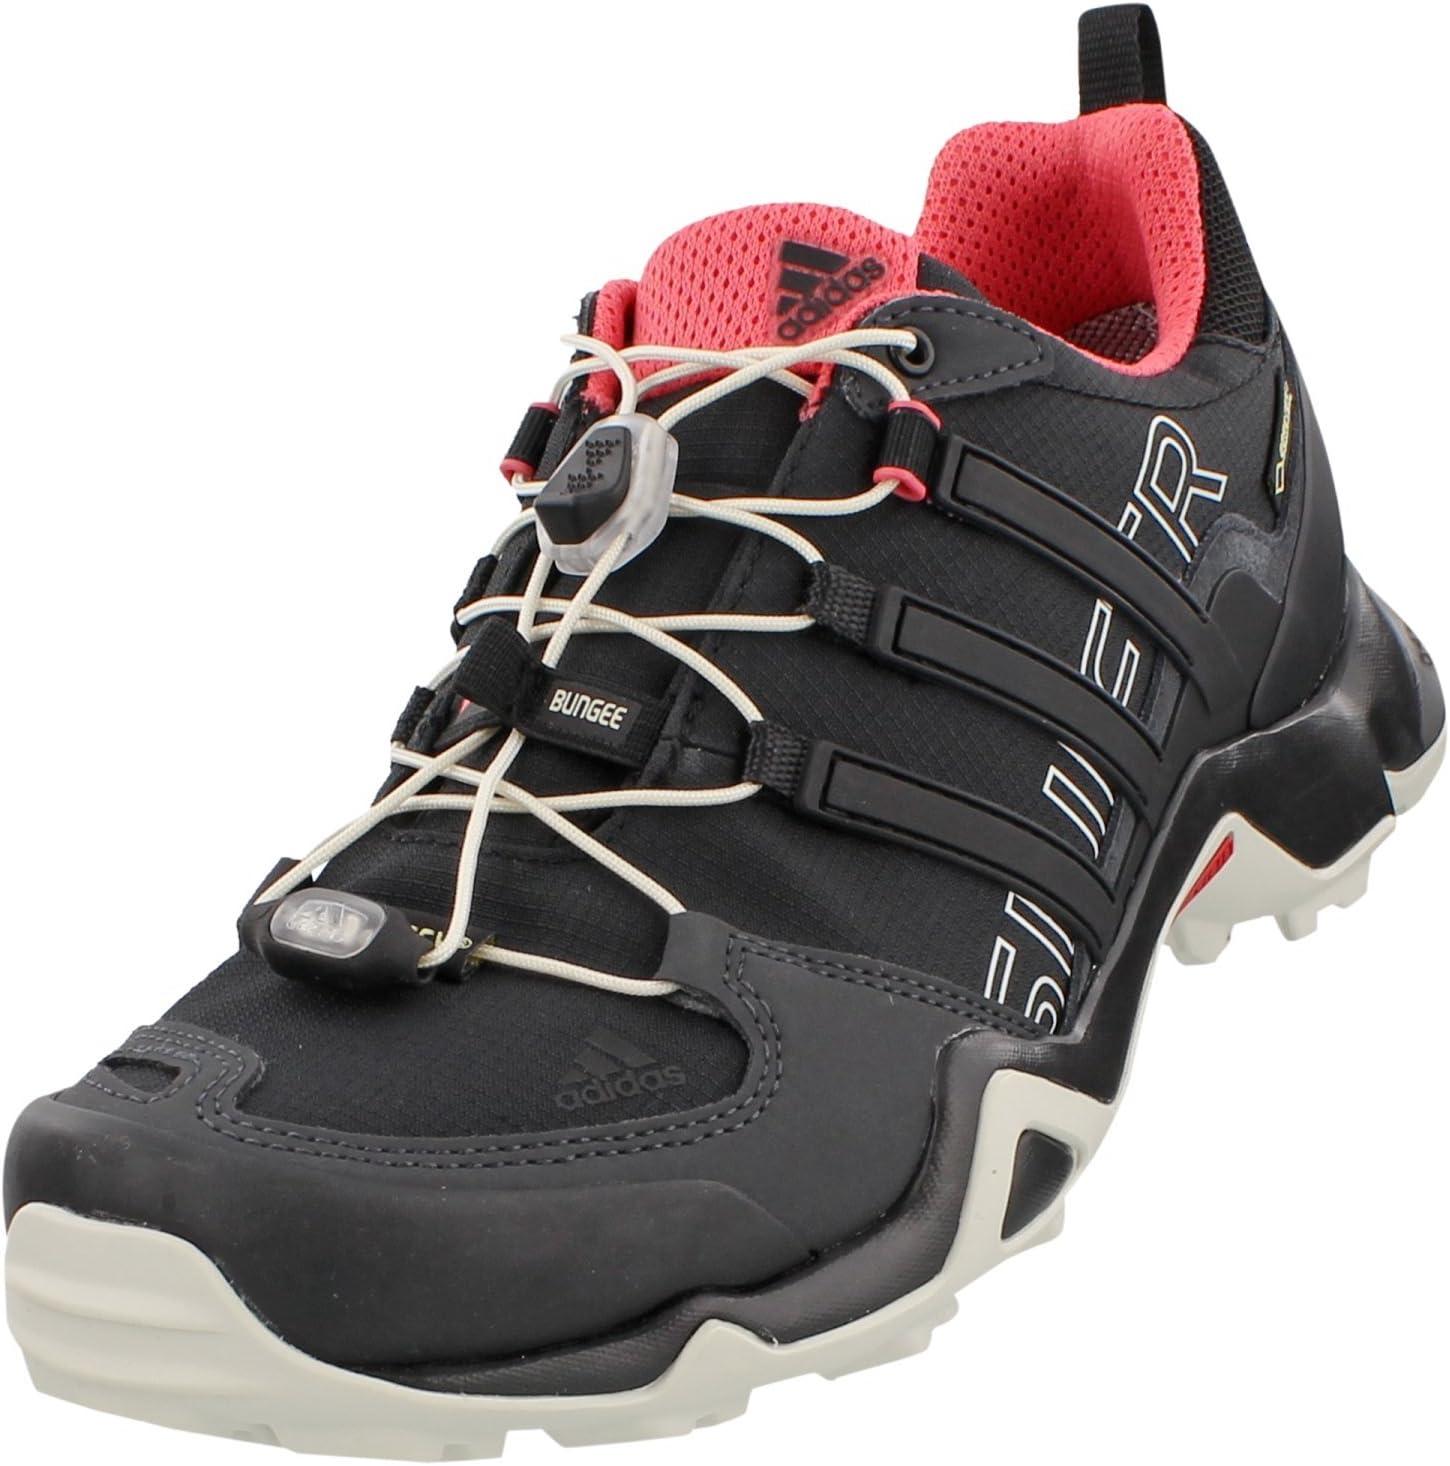 Boda Púrpura tsunami  Amazon.com: Adidas Terrex Swift R Gtx W Dark Grey / Black / Super Blush  Women's Hiking Shoes - 5.5 B(M) US: Sports & Outdoors